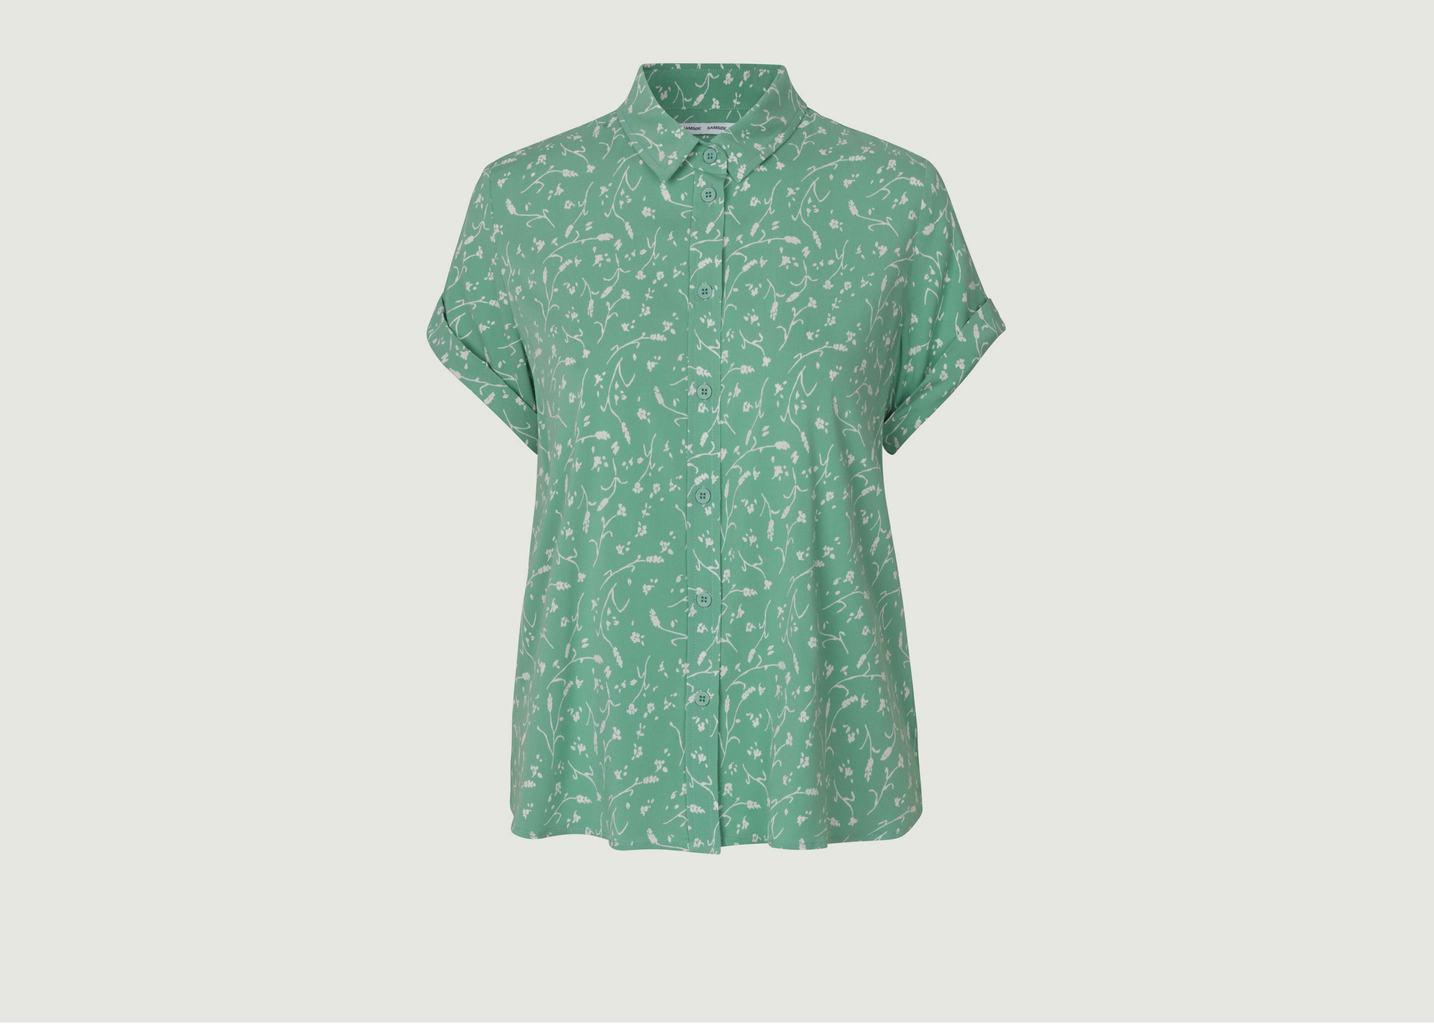 Chemise manches courtes fleurie Majan - Samsoe Samsoe